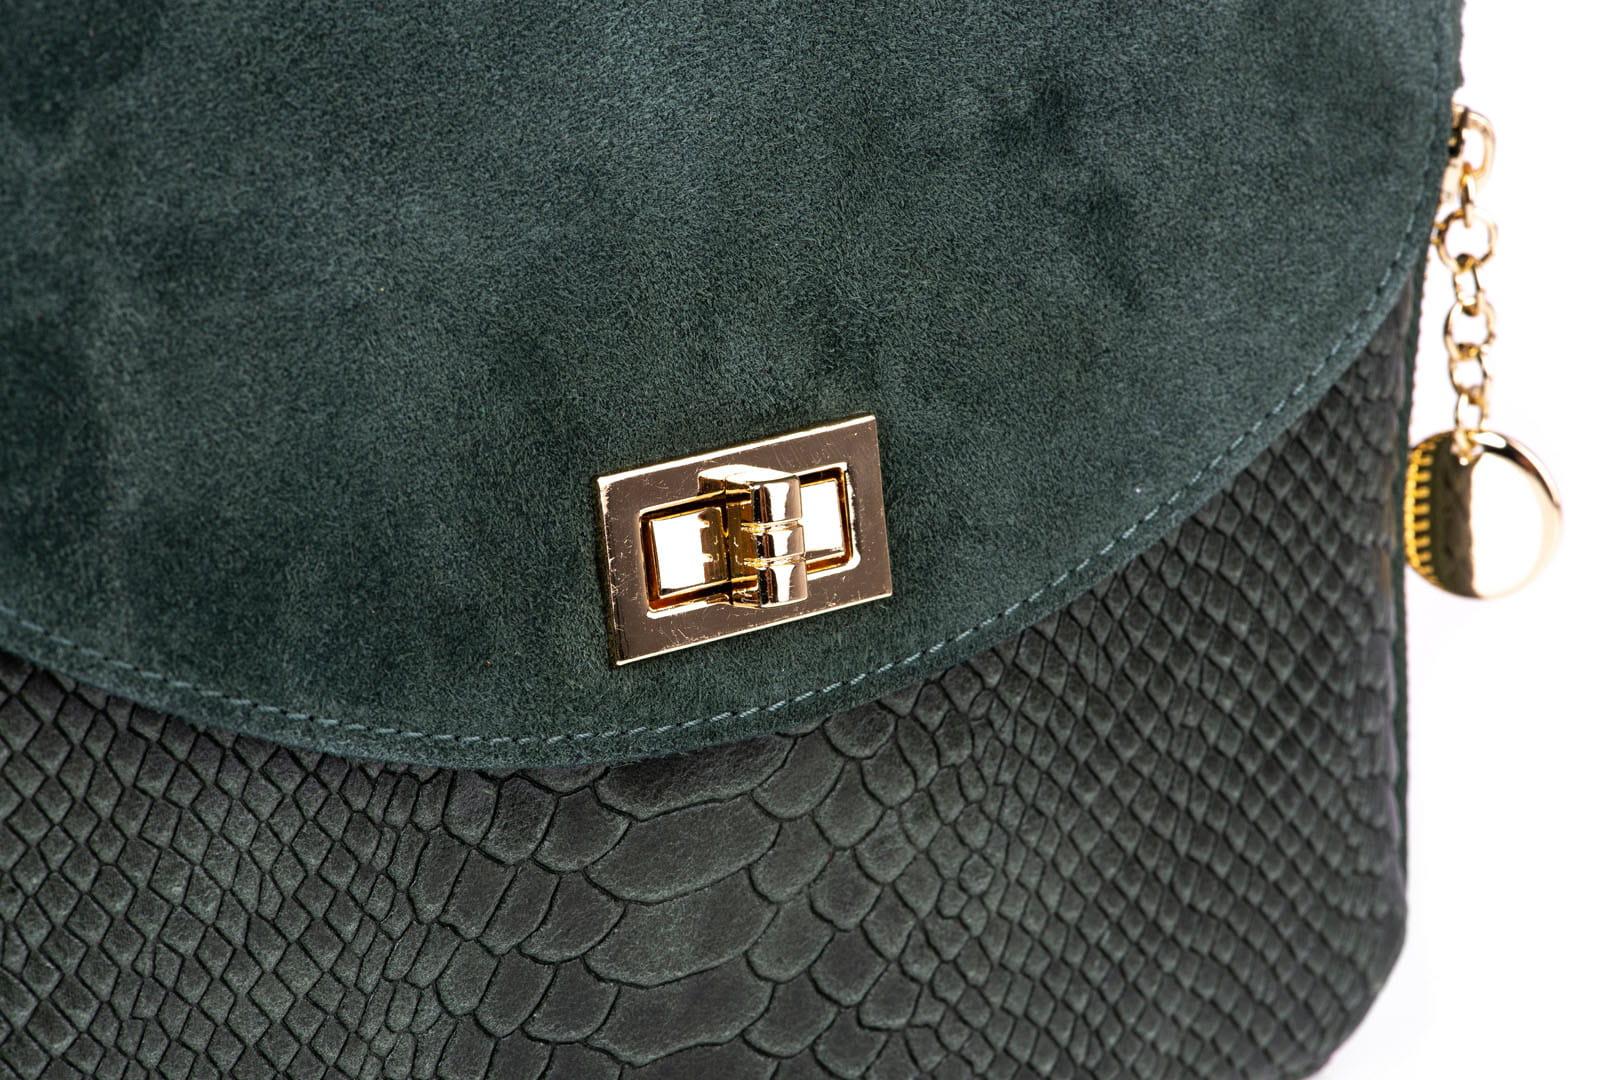 0e3400420c900 Torebka Damska Skórzana Vera Pelle Łuski Zieleń Butelkowa Leather Box